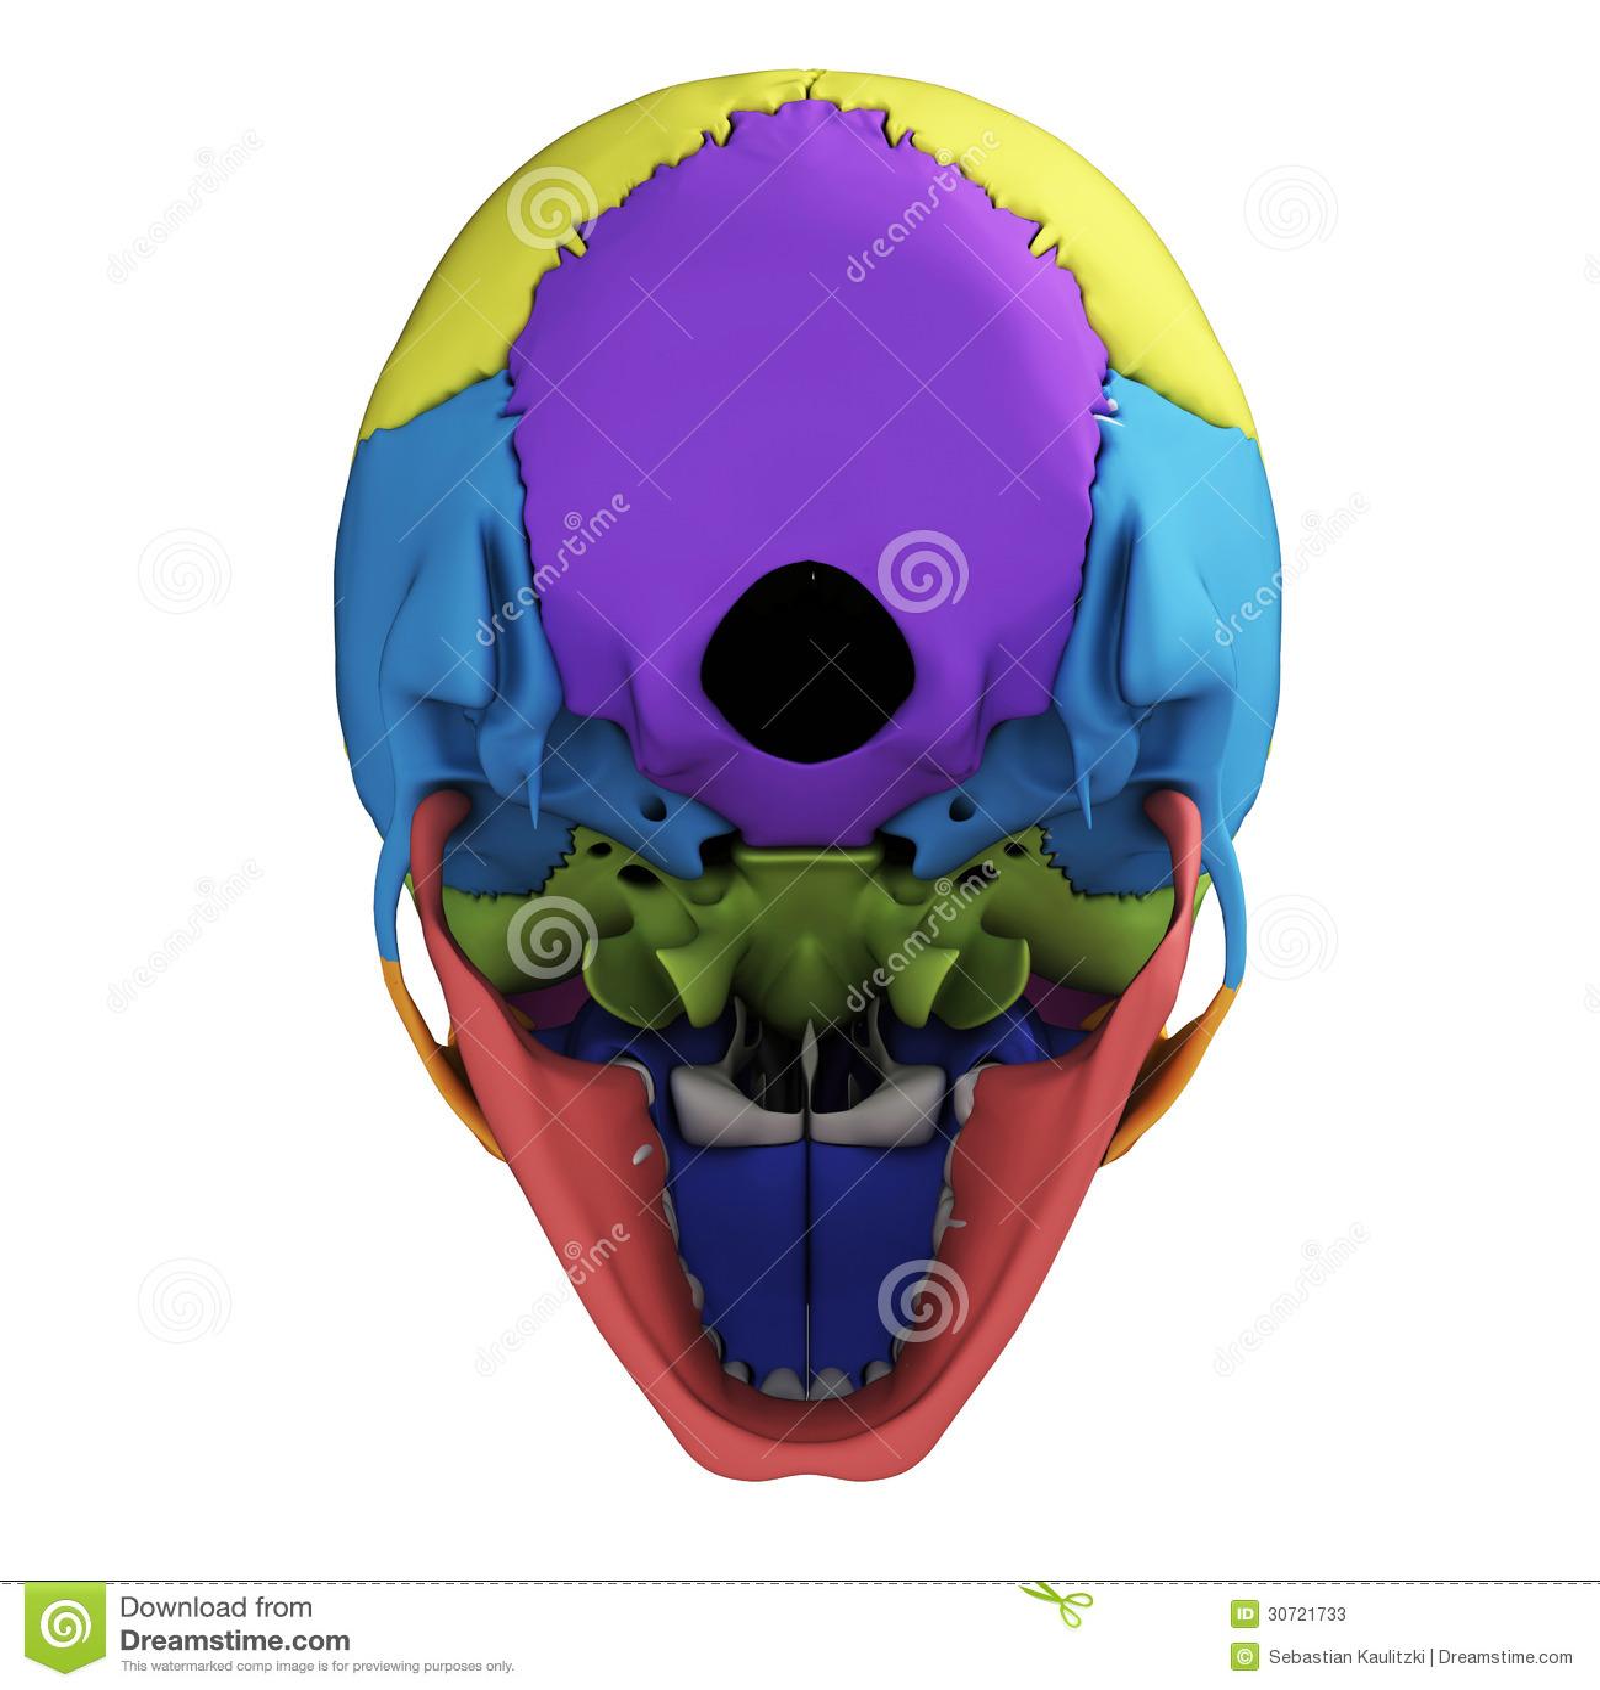 Human Skull Anatomy Stock Illustration Illustration Of Head 30721733